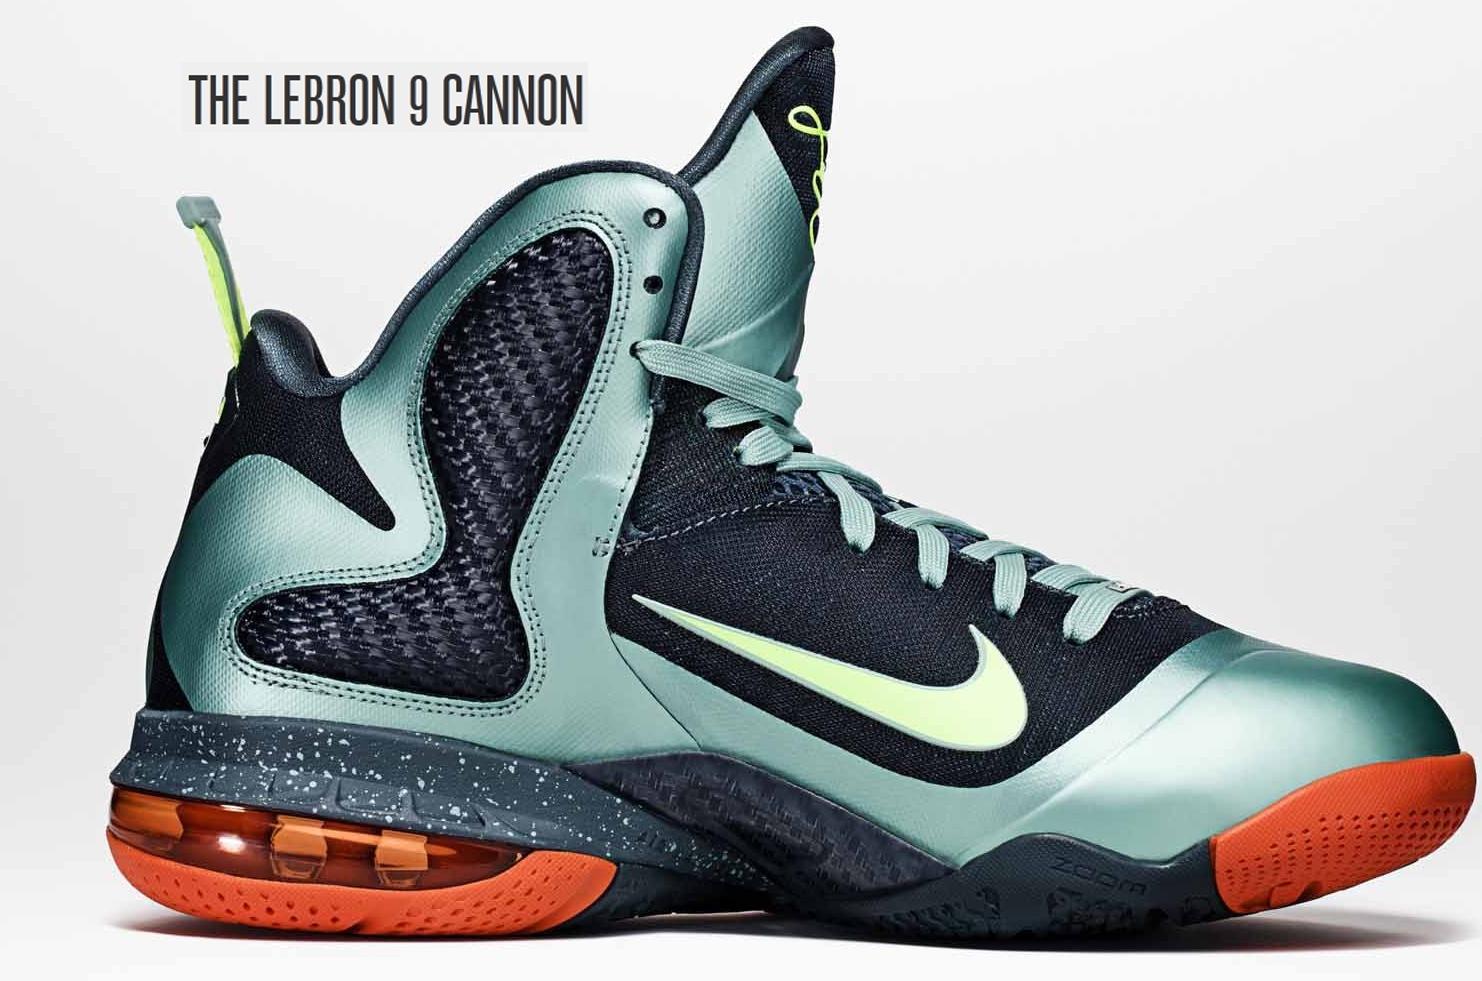 LeBron James Shoes Logo Wallpapers - Wallpaper Cave